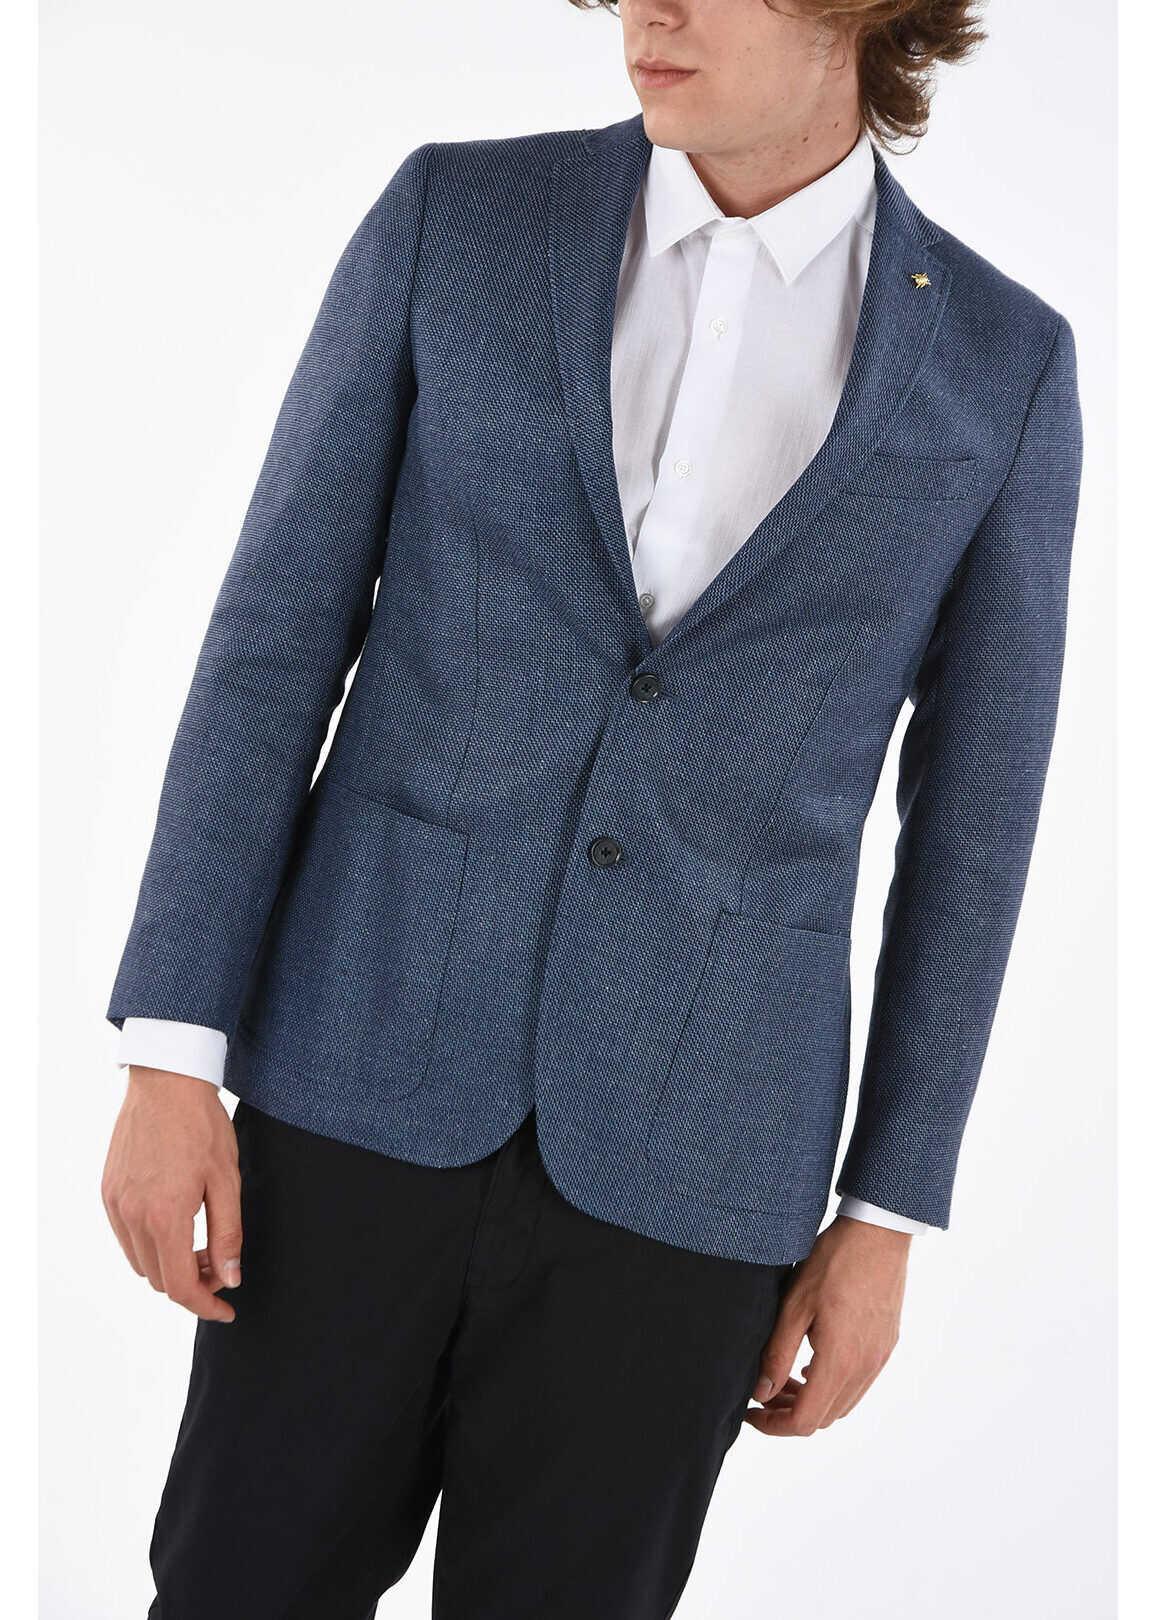 CORNELIANI CC COLLECTION hopsack RIGHT patch pocket 2-button blazer BLUE imagine